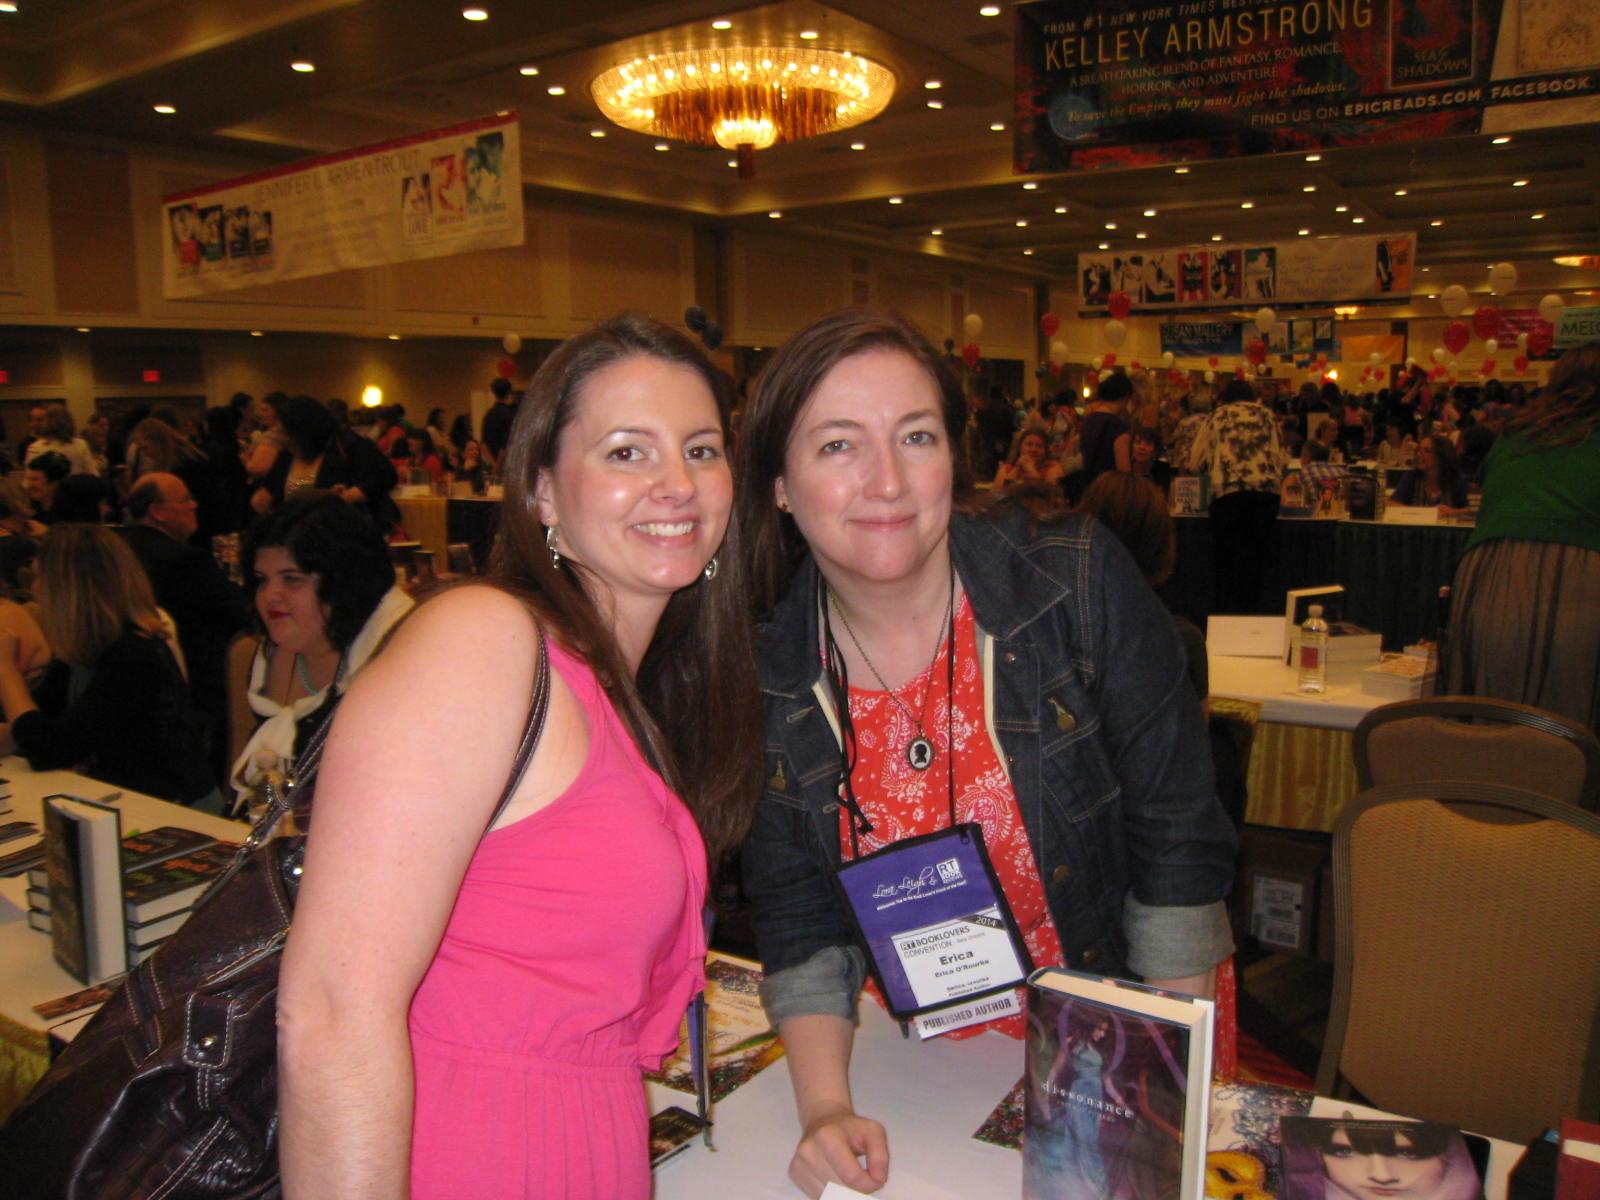 Jessica & Erica O'Rourke